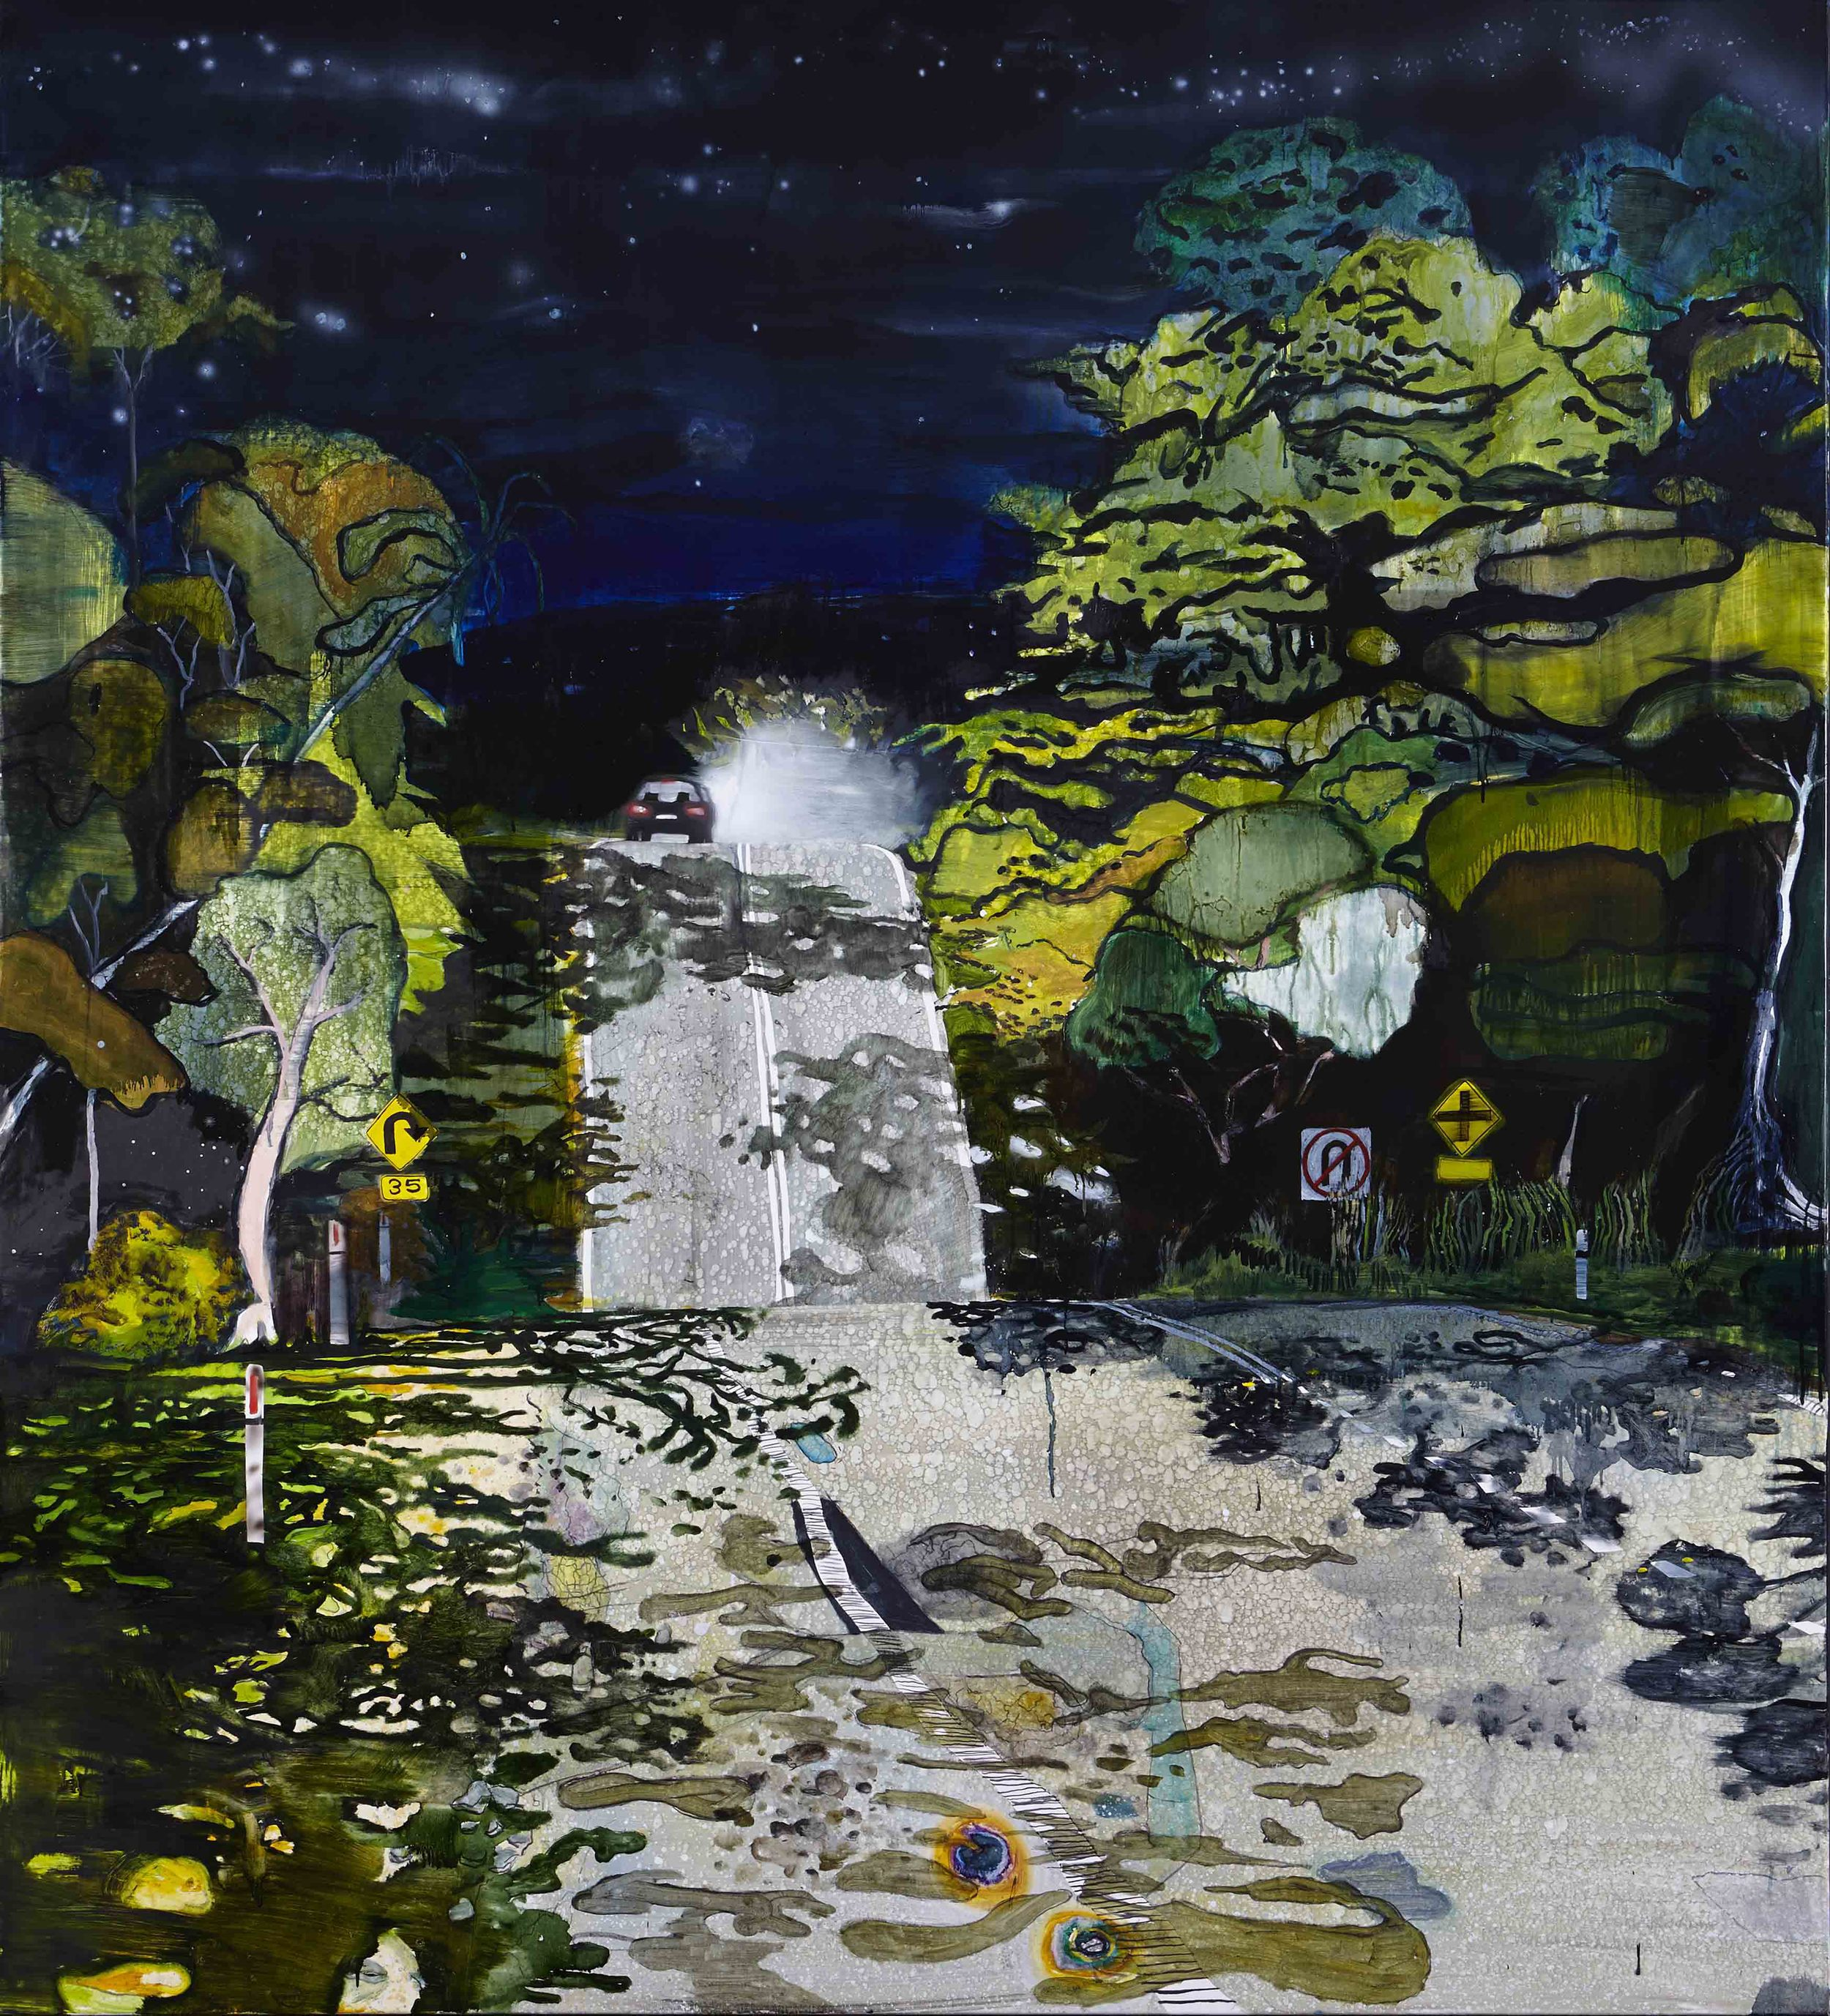 Moonlight (i),  2014 Acrylic, oil and enamel on linen 200 x 180 cm